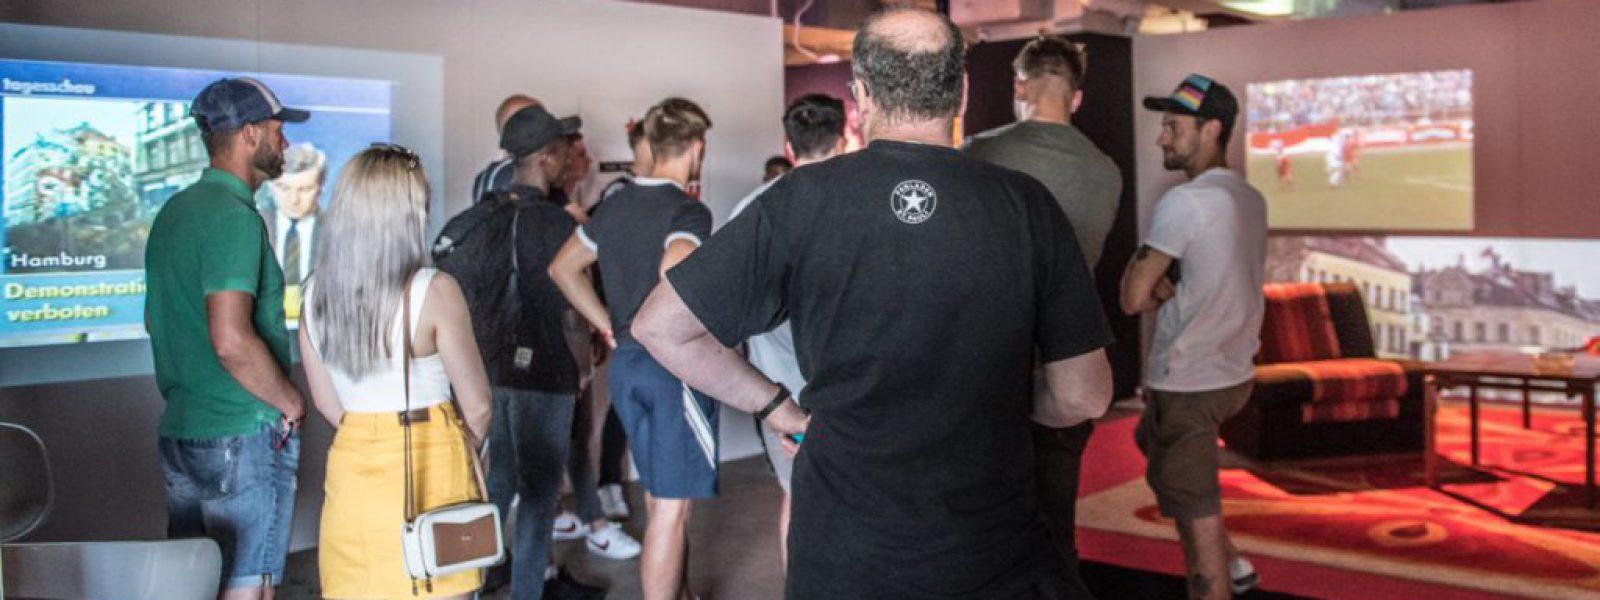 2019_0623 FC St Pauli erste Mannschaft im KIEZBEBEN (Foto Sabrina Adeline Nagel) - 35